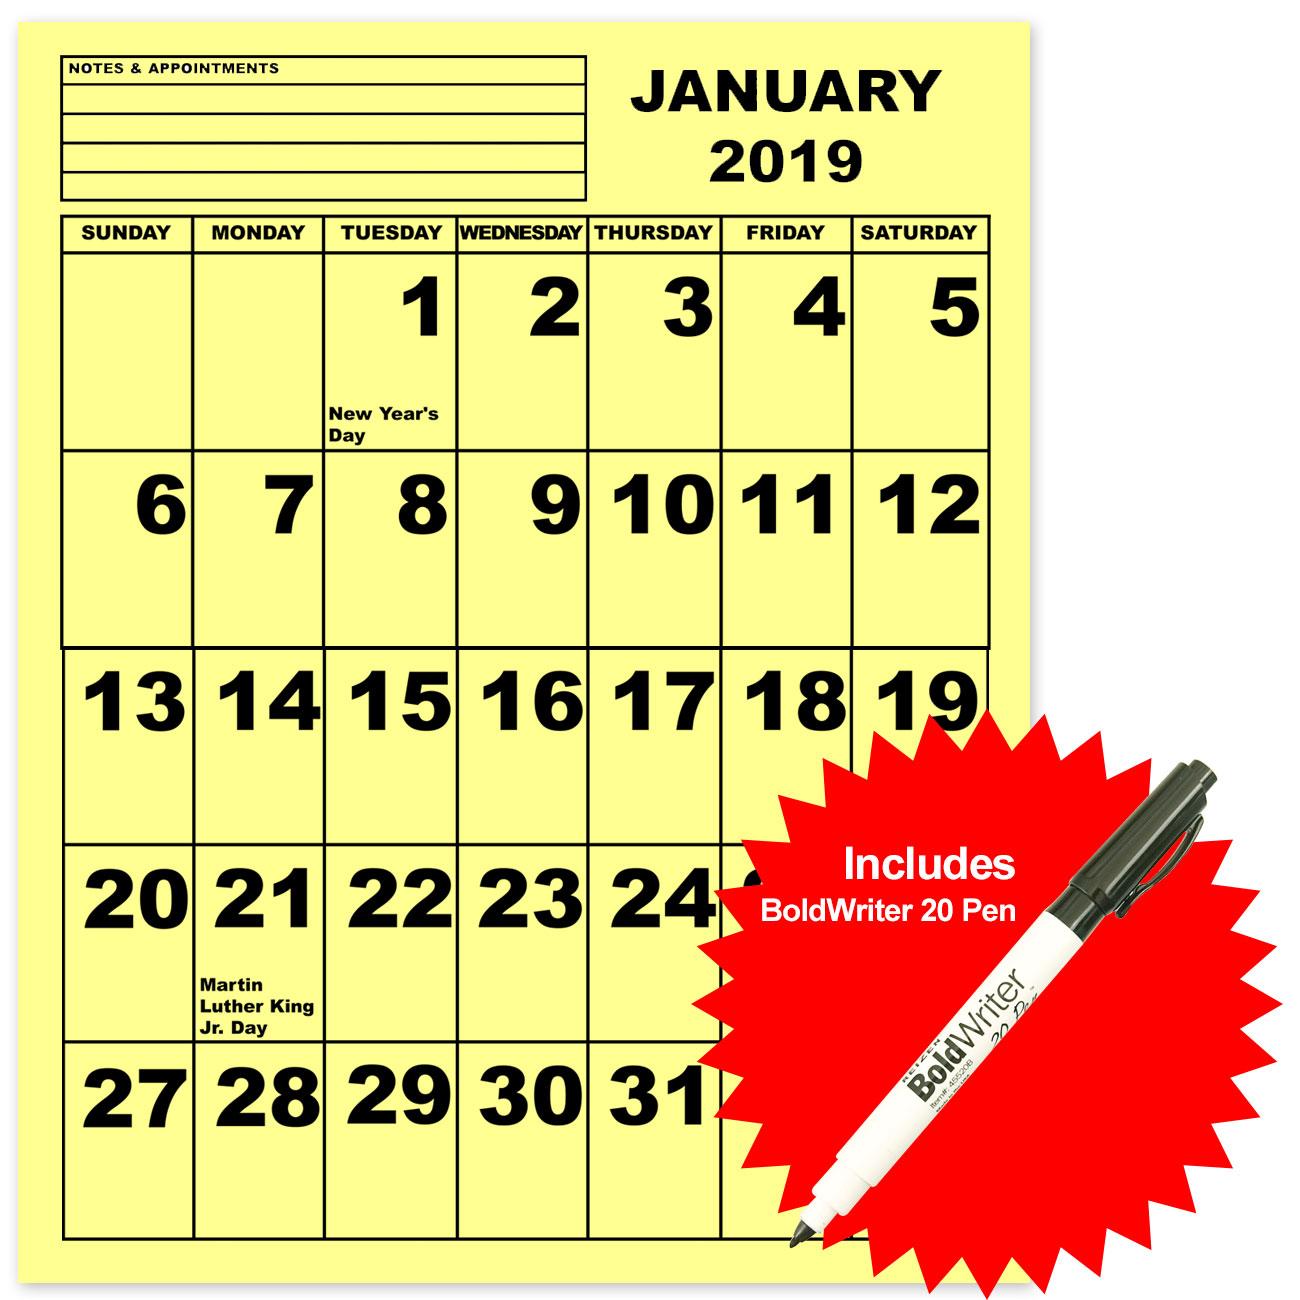 Jumbo Print Calendar - Yellow - 2019 - with BoldWriter 20 Pen